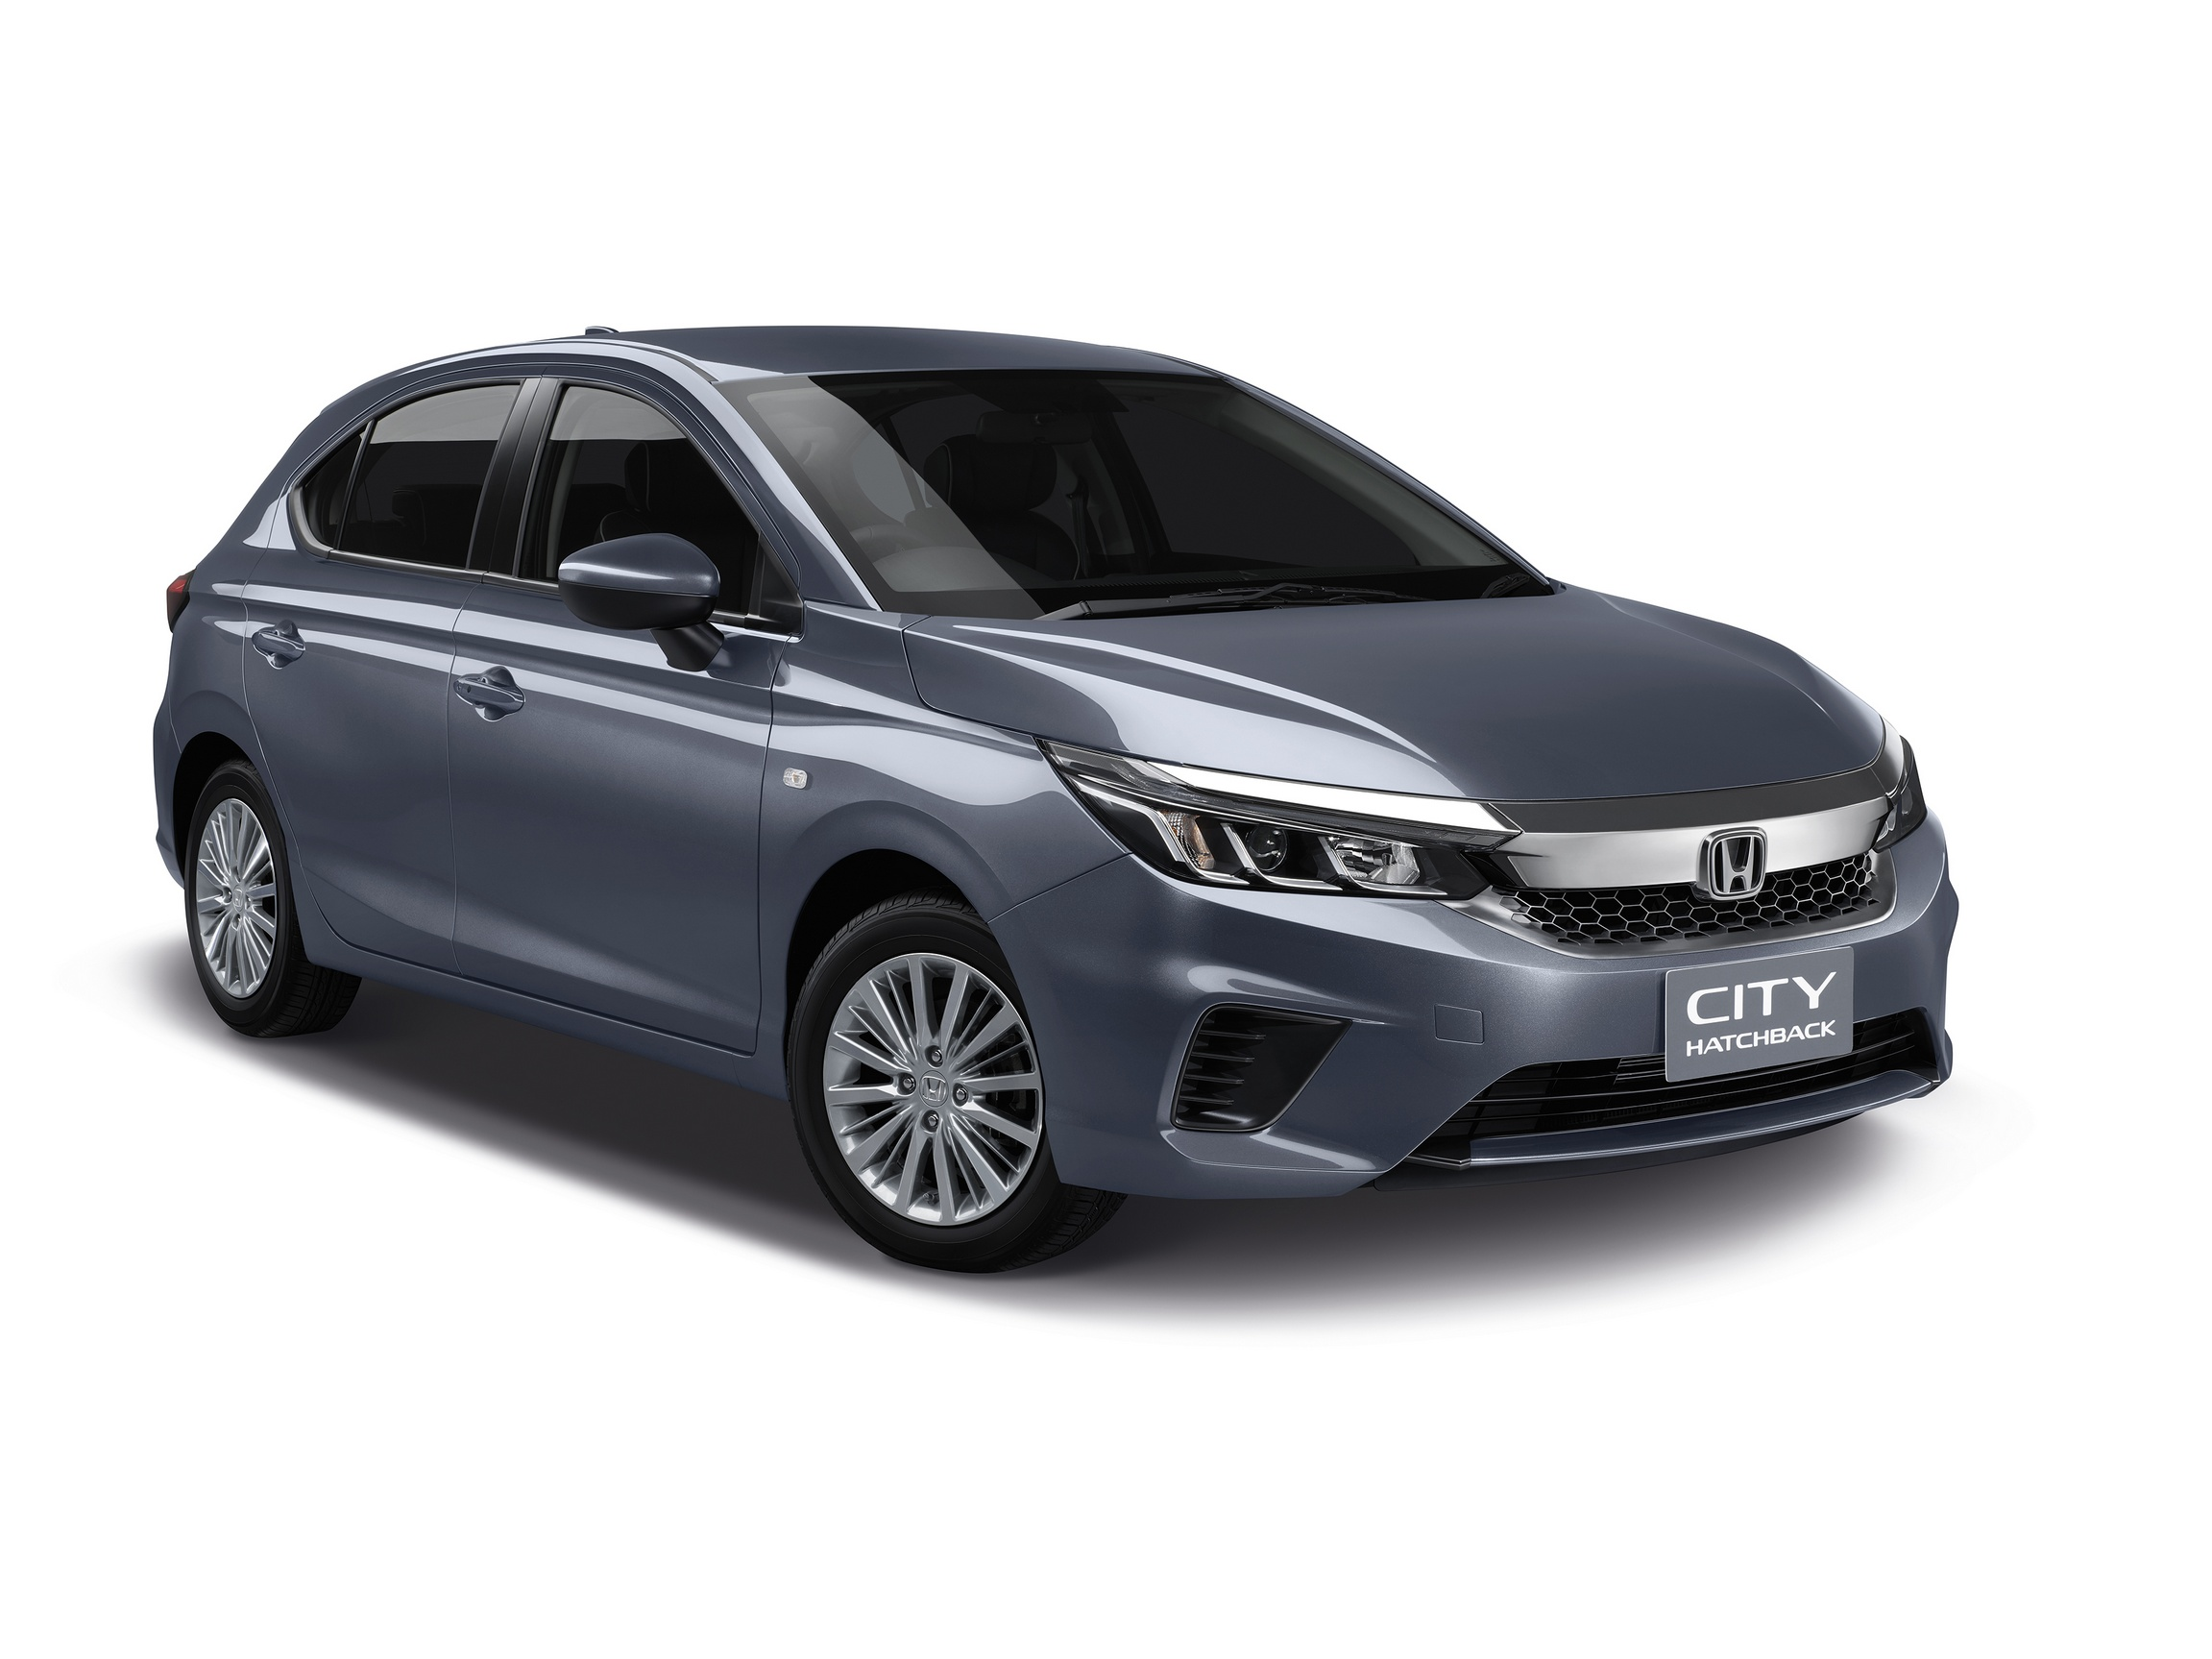 Honda City Hacthback S+ ปี 2020 ราคา-สเปค-โปรโมชั่น